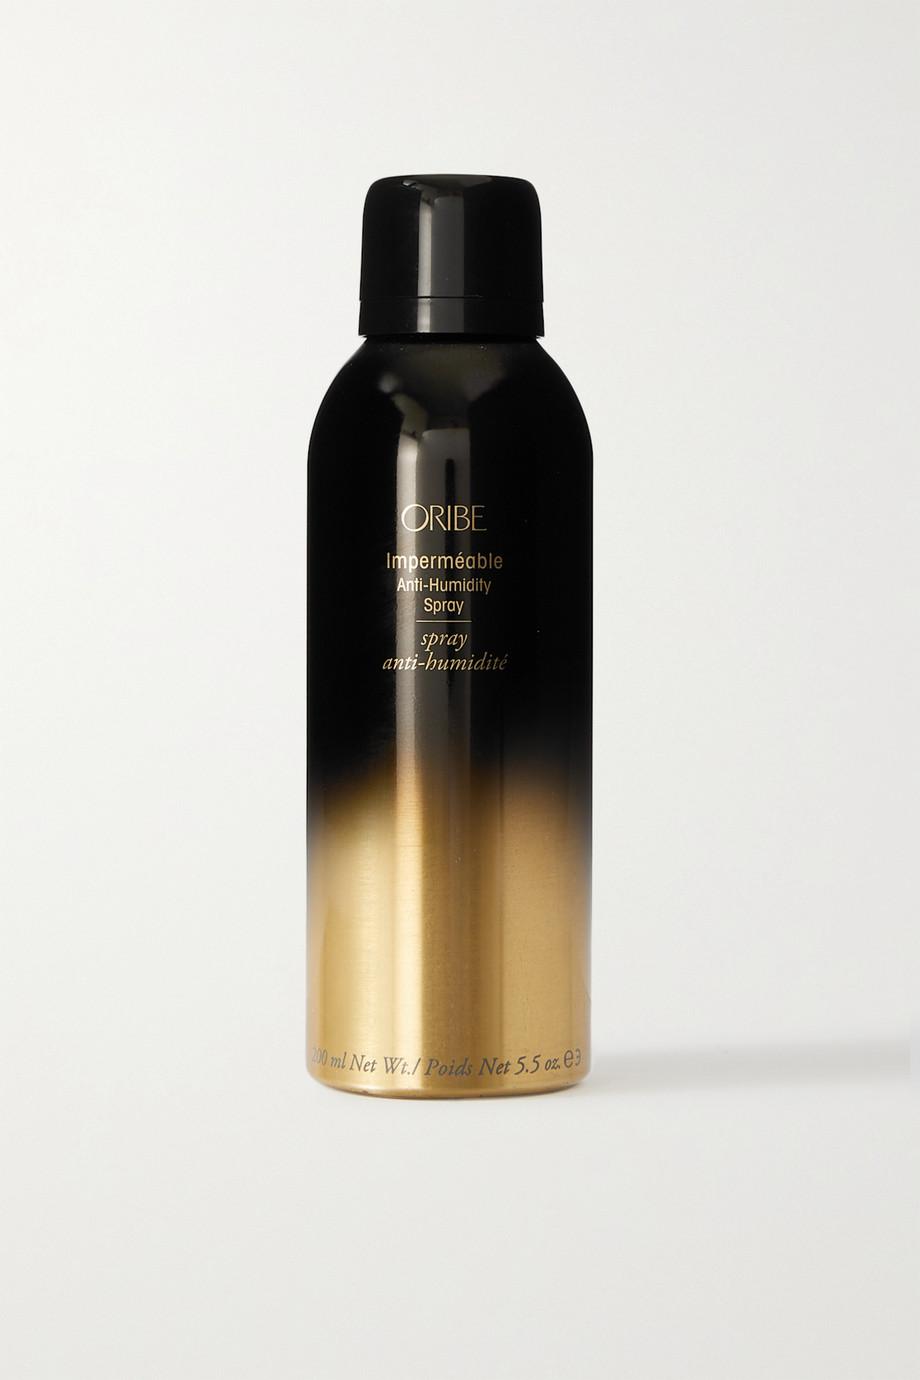 Imperméable Anti-Humidity Spray, 200ml, by Oribe